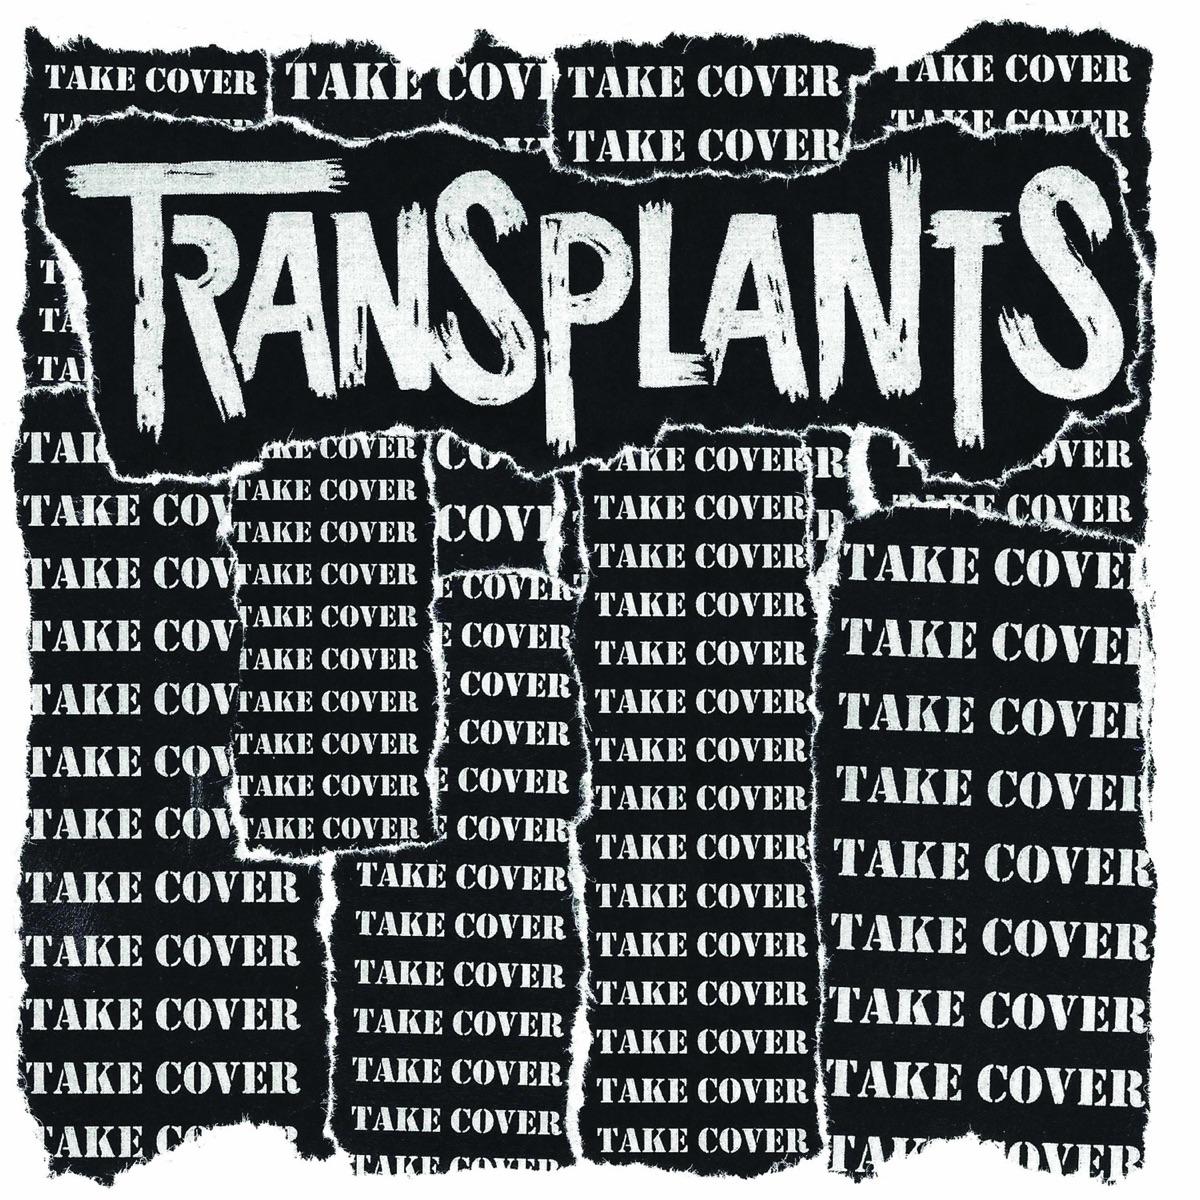 Cover of music album Take Cover